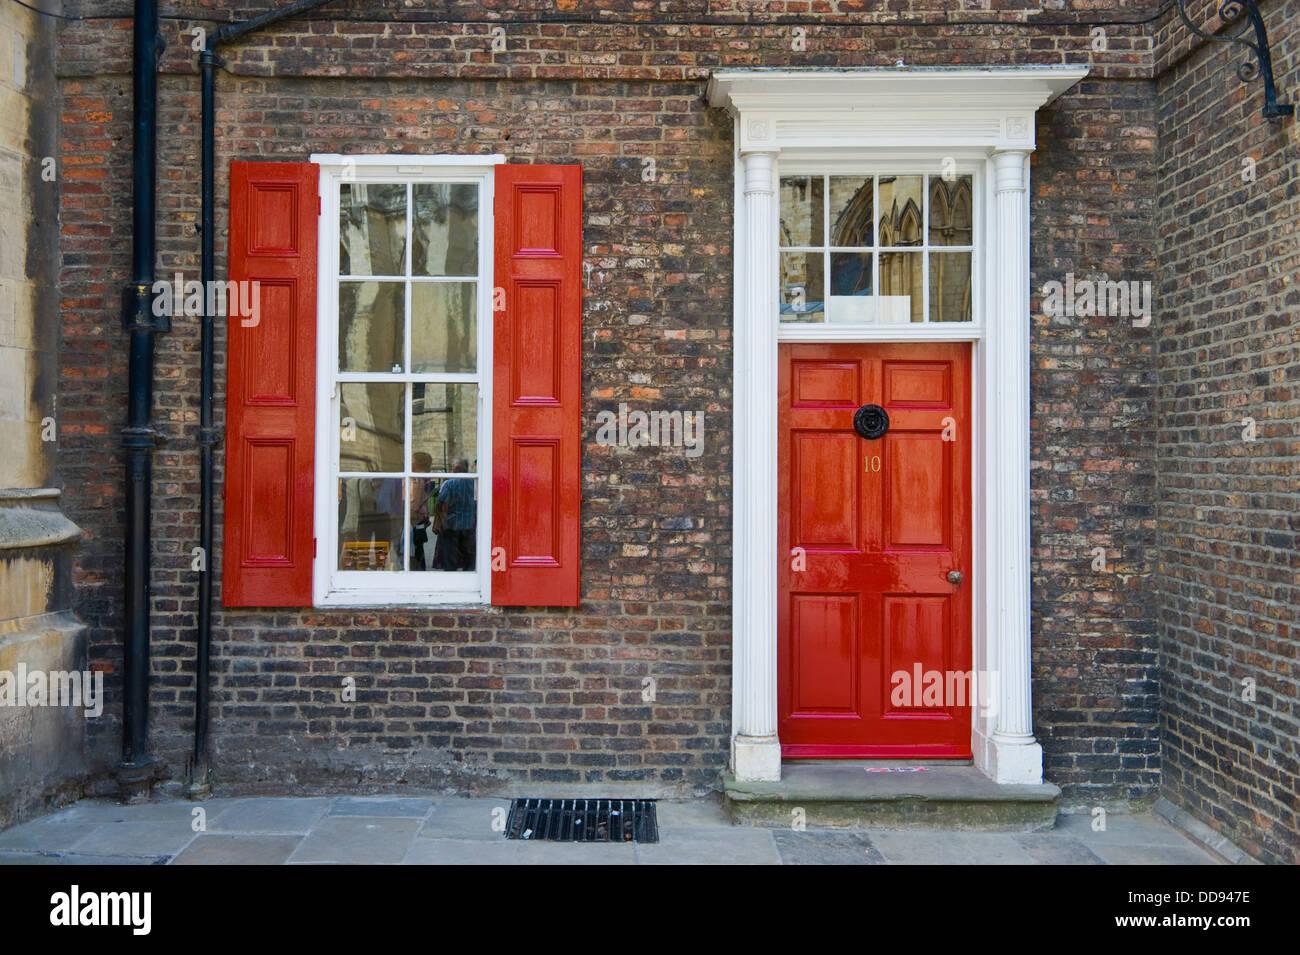 Red Front Door Georgian House With Red Front Door And Christmas Wreath Stock